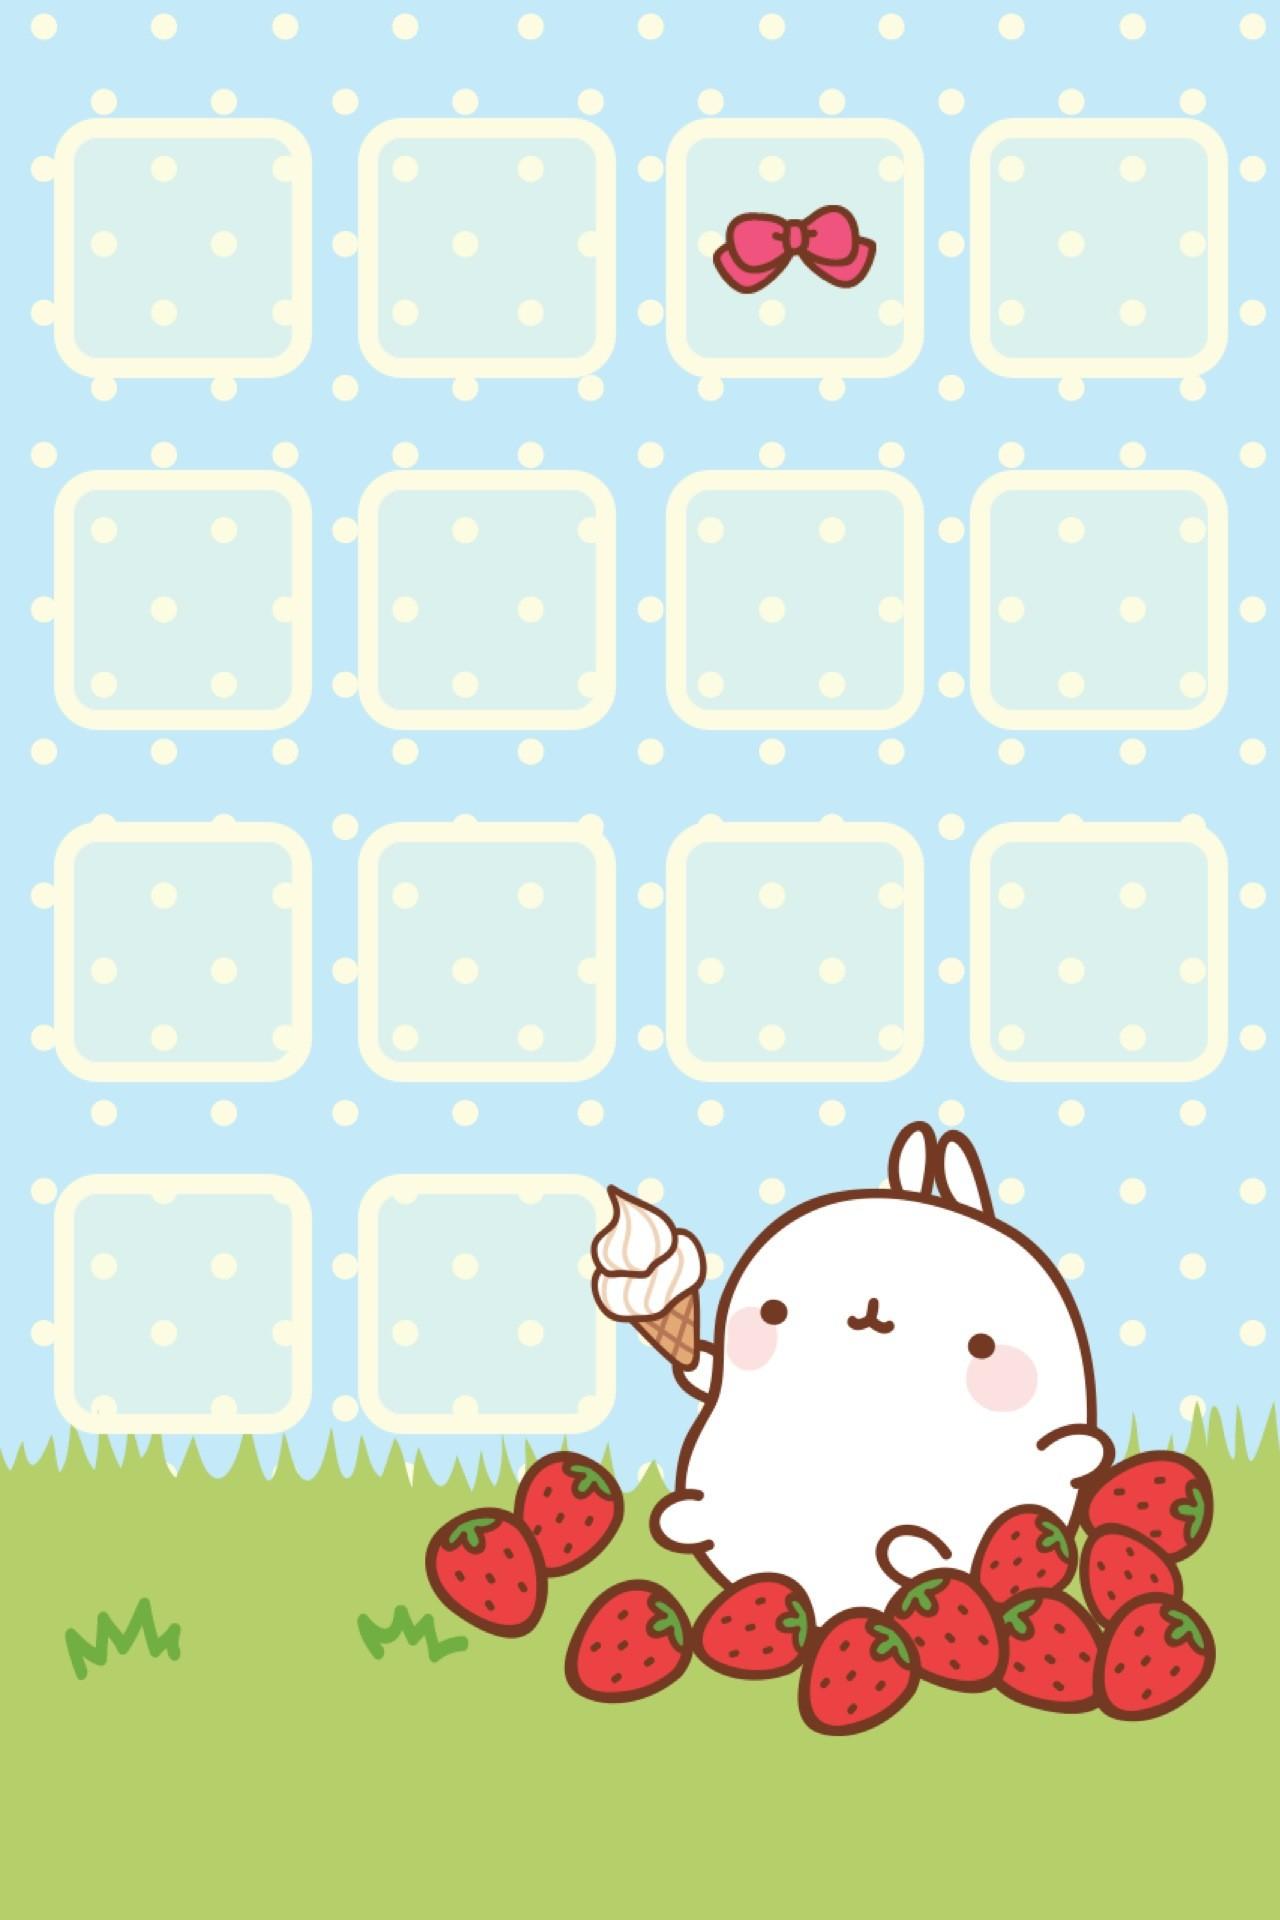 Wallpaper Lucu Iphone 11